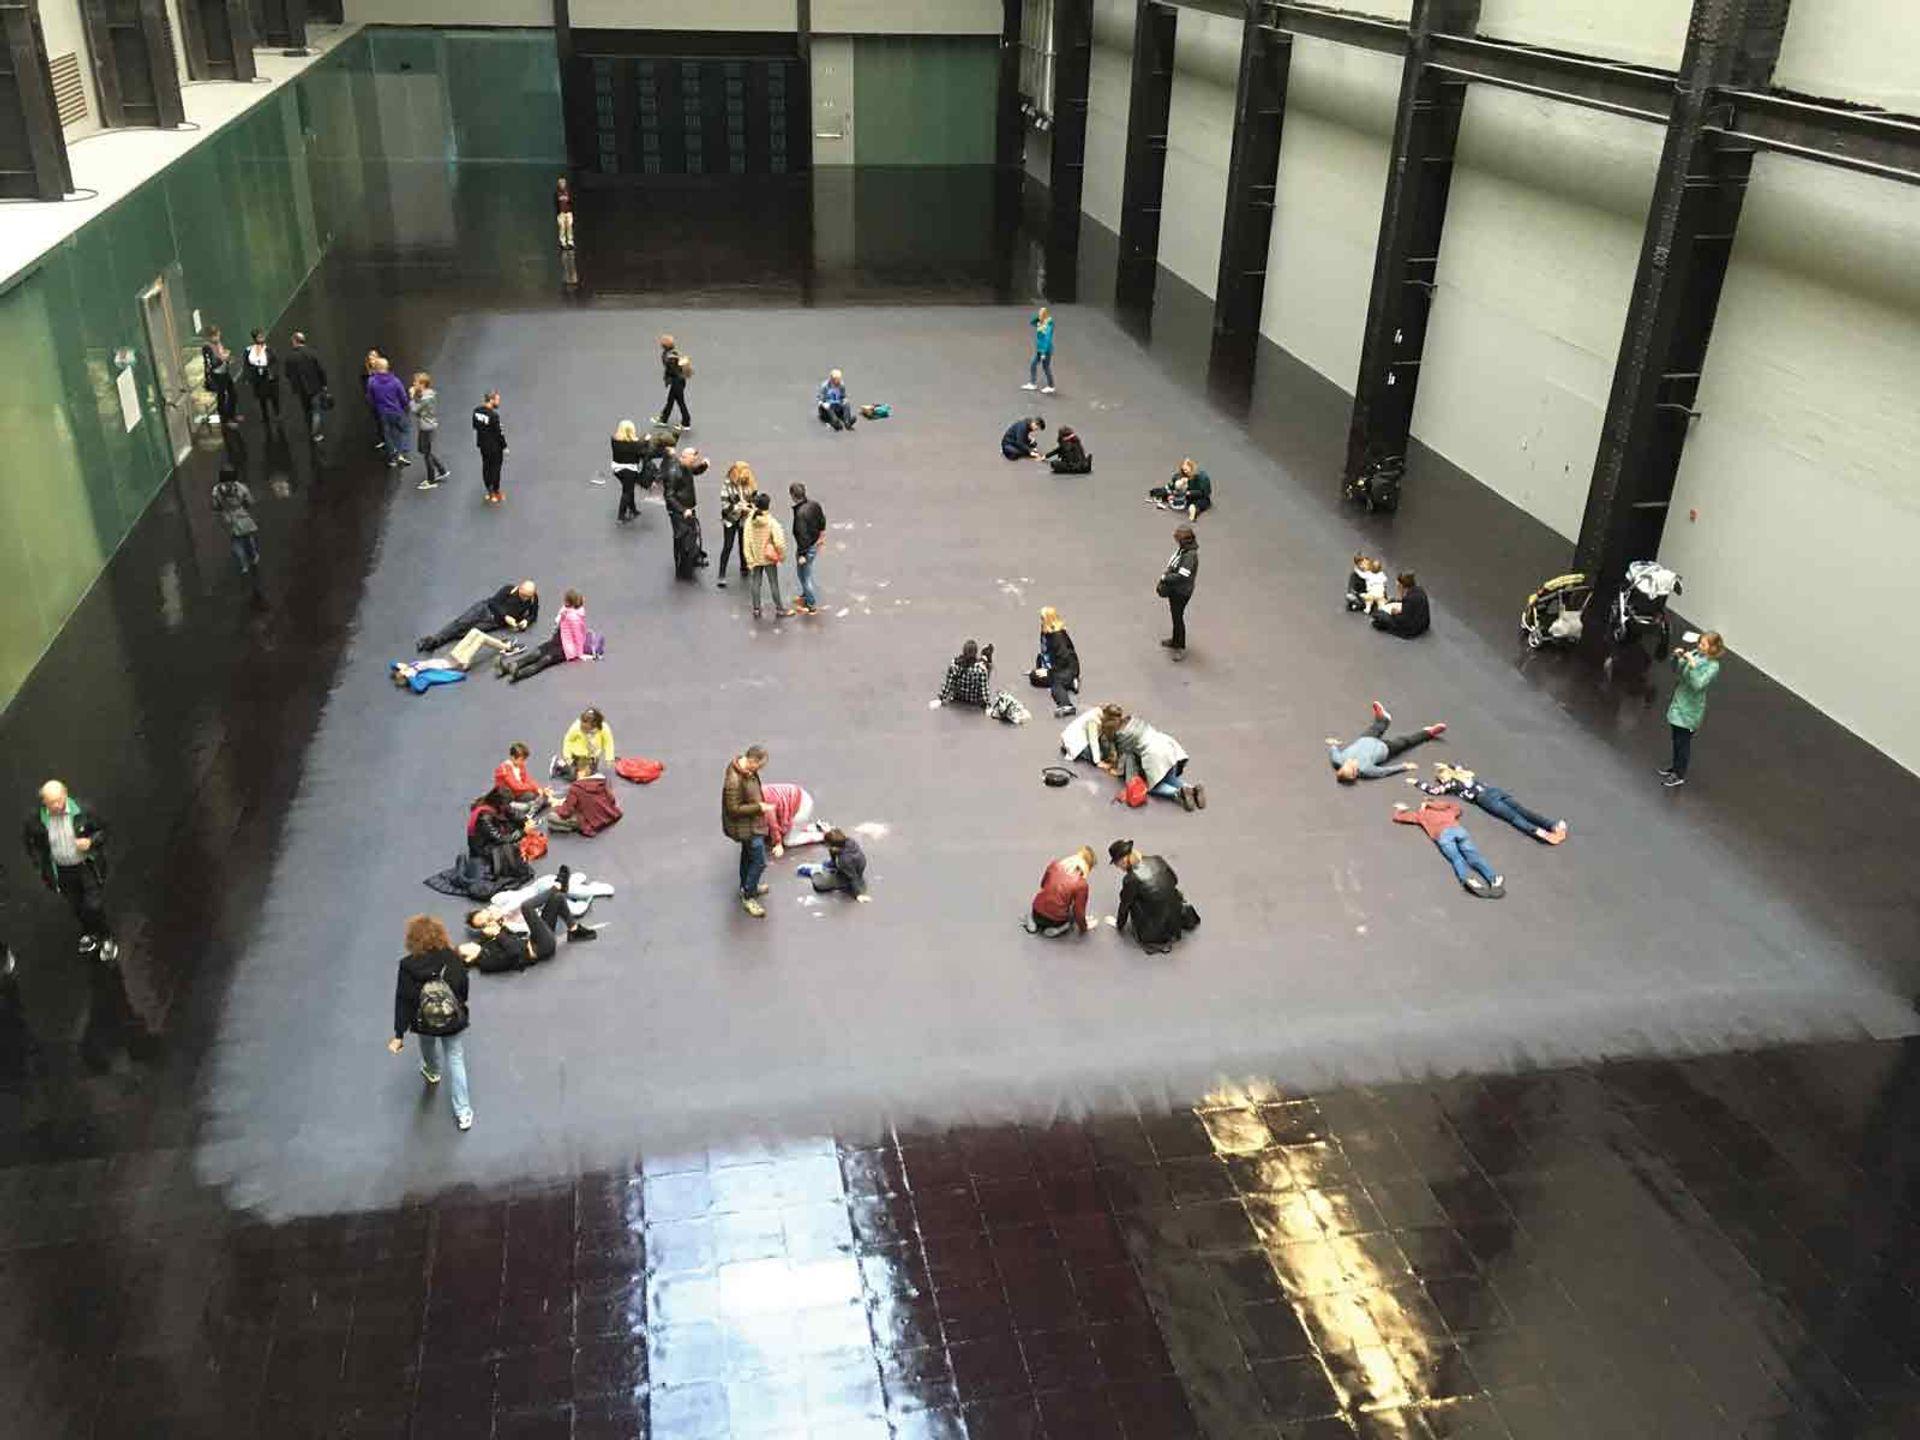 The paint on the Turbine Hall's floor changes colour with body heat José da Silva